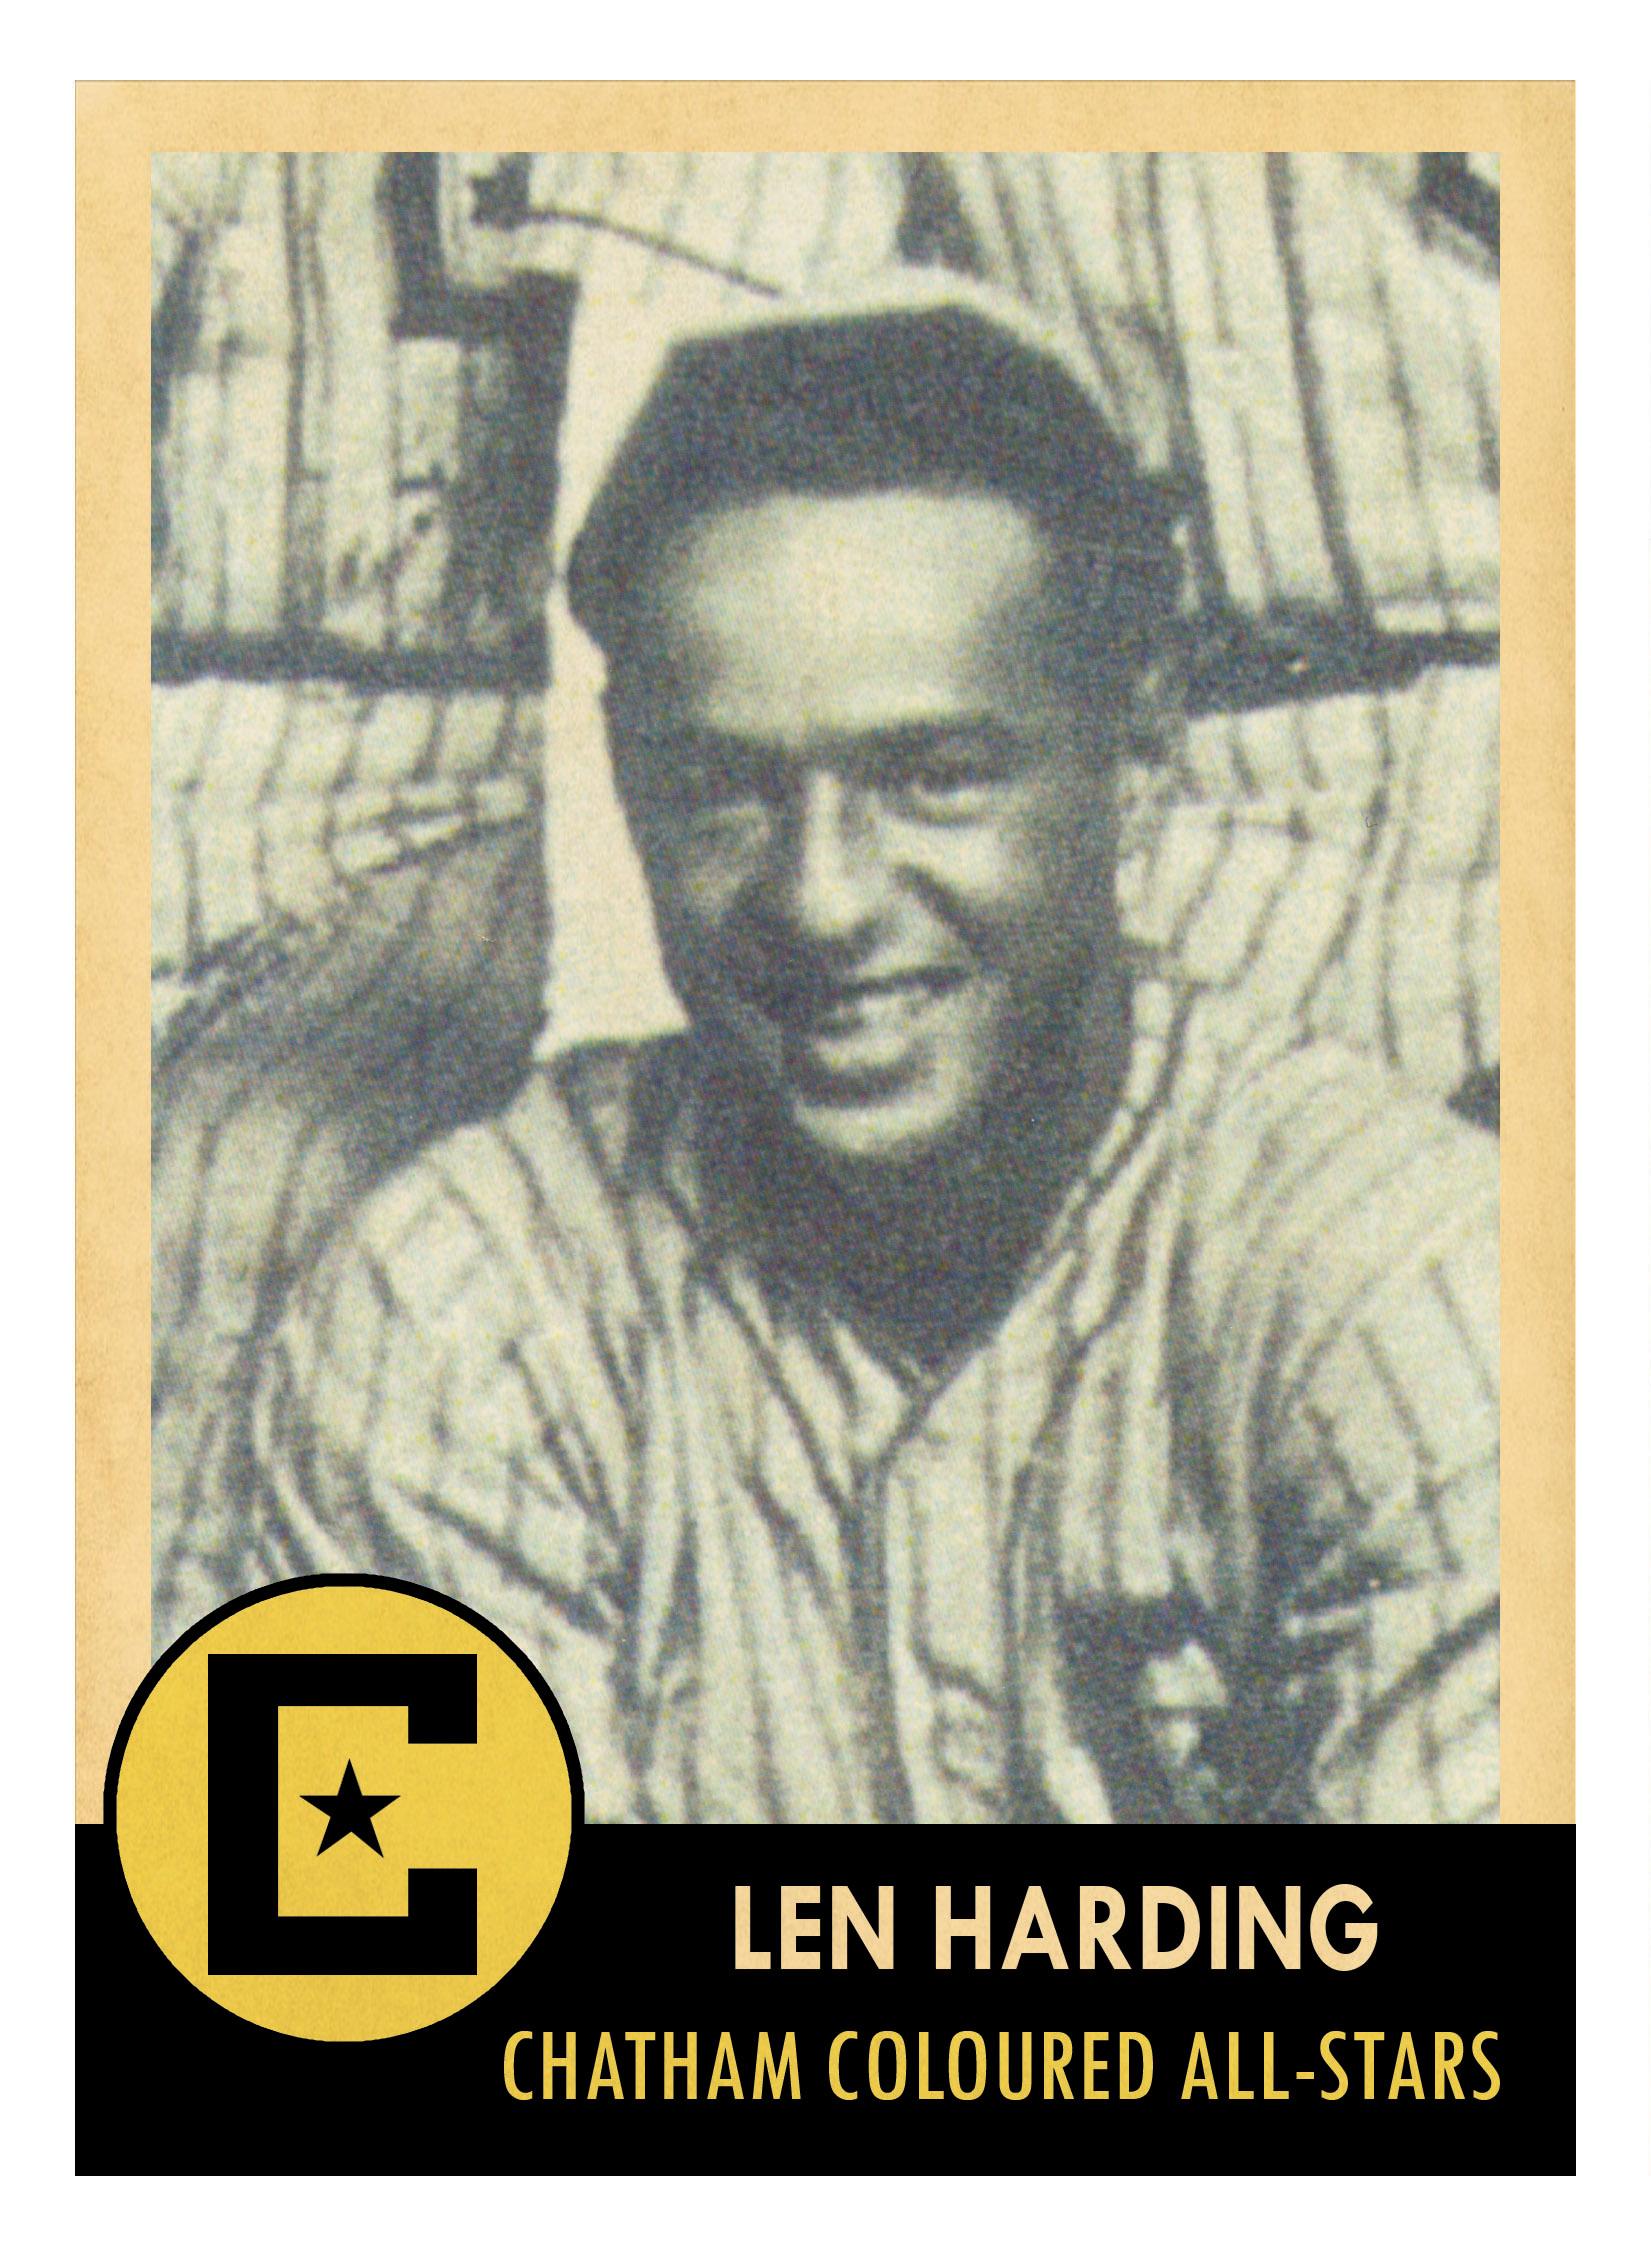 Andy Harding in baseball uniform